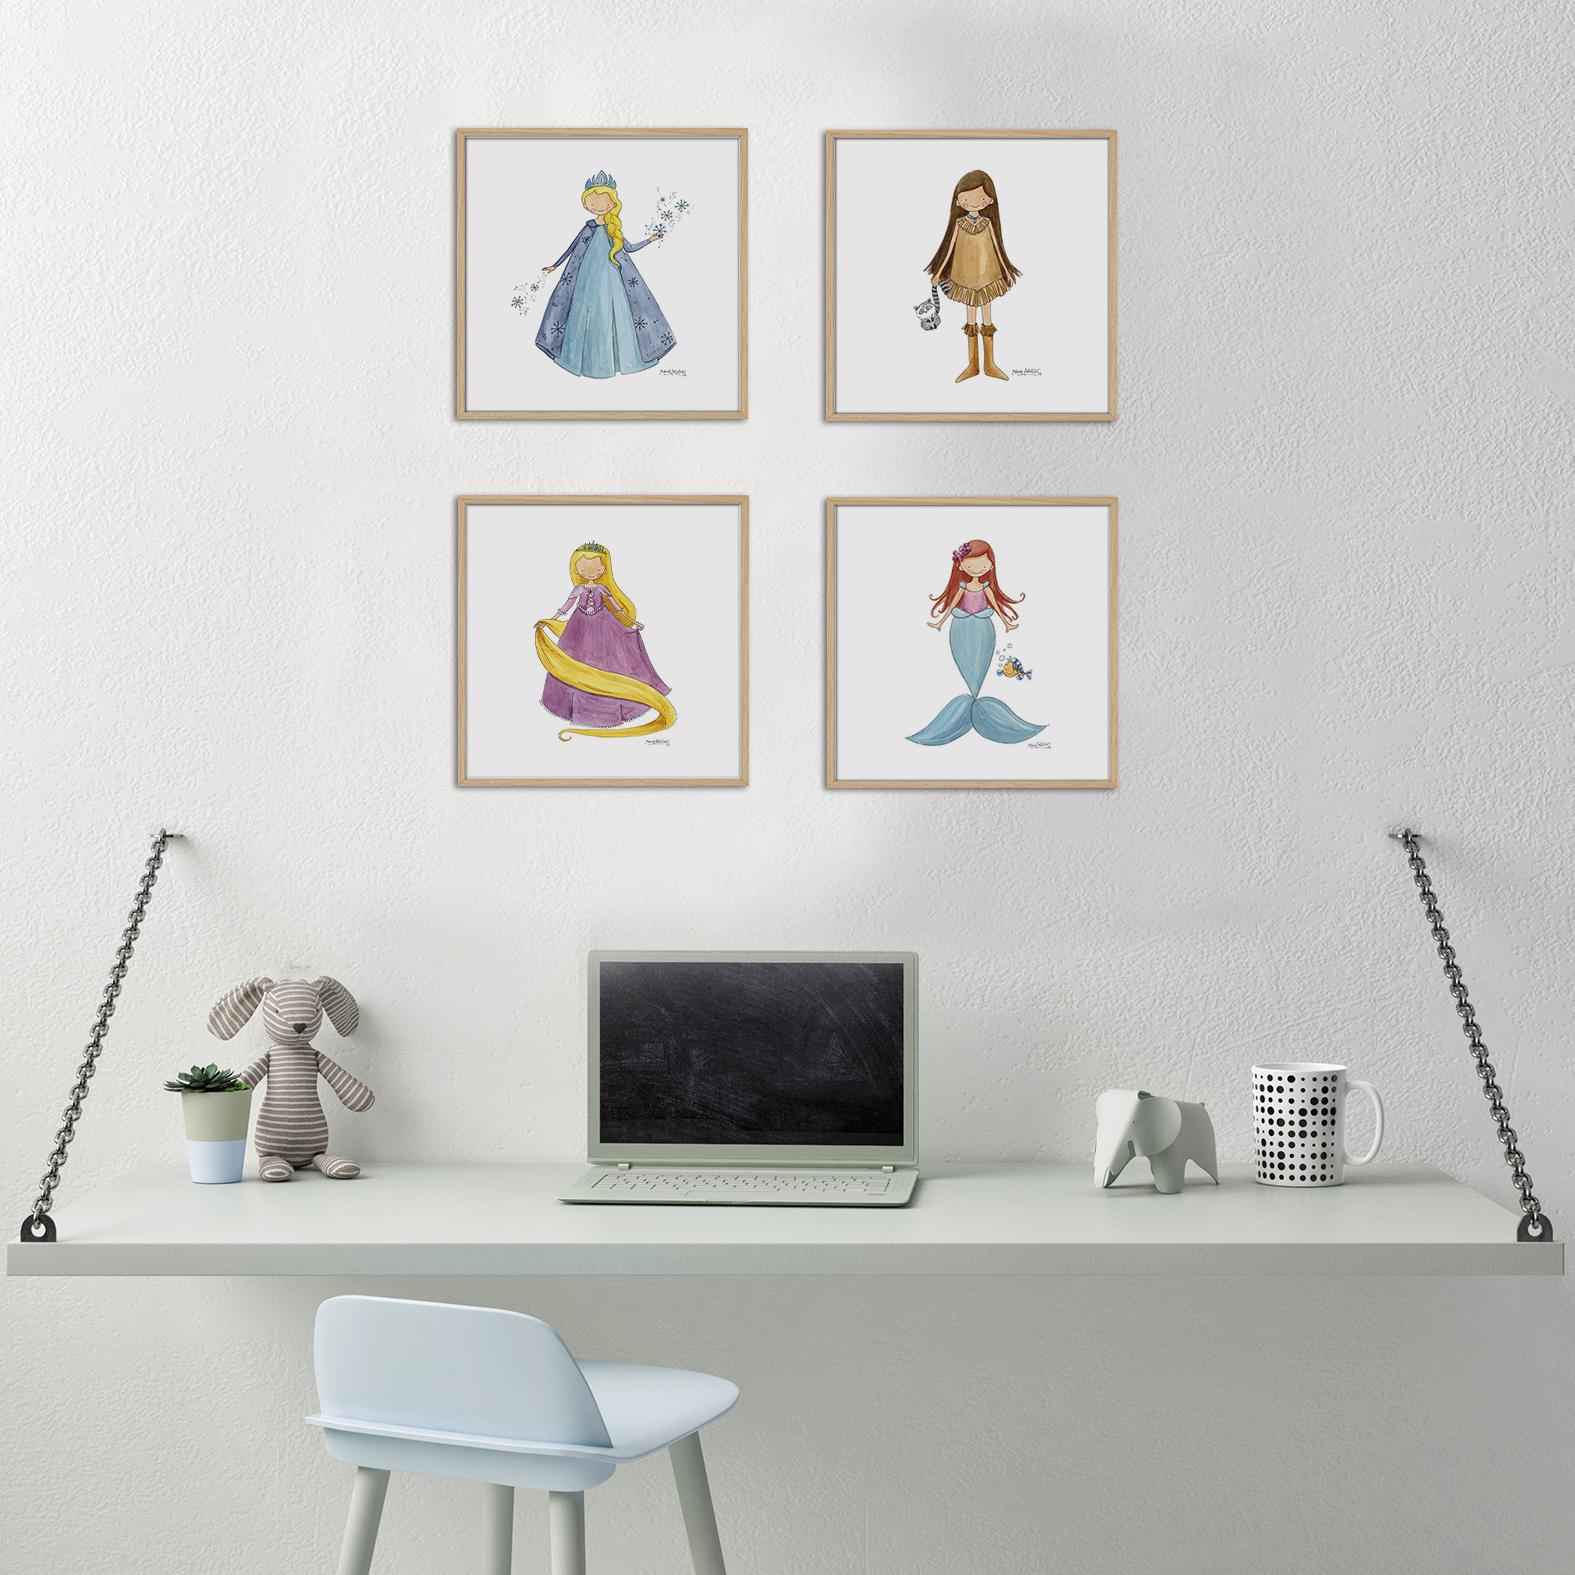 princesas - Cuadro Princesas Frozen Pequeño